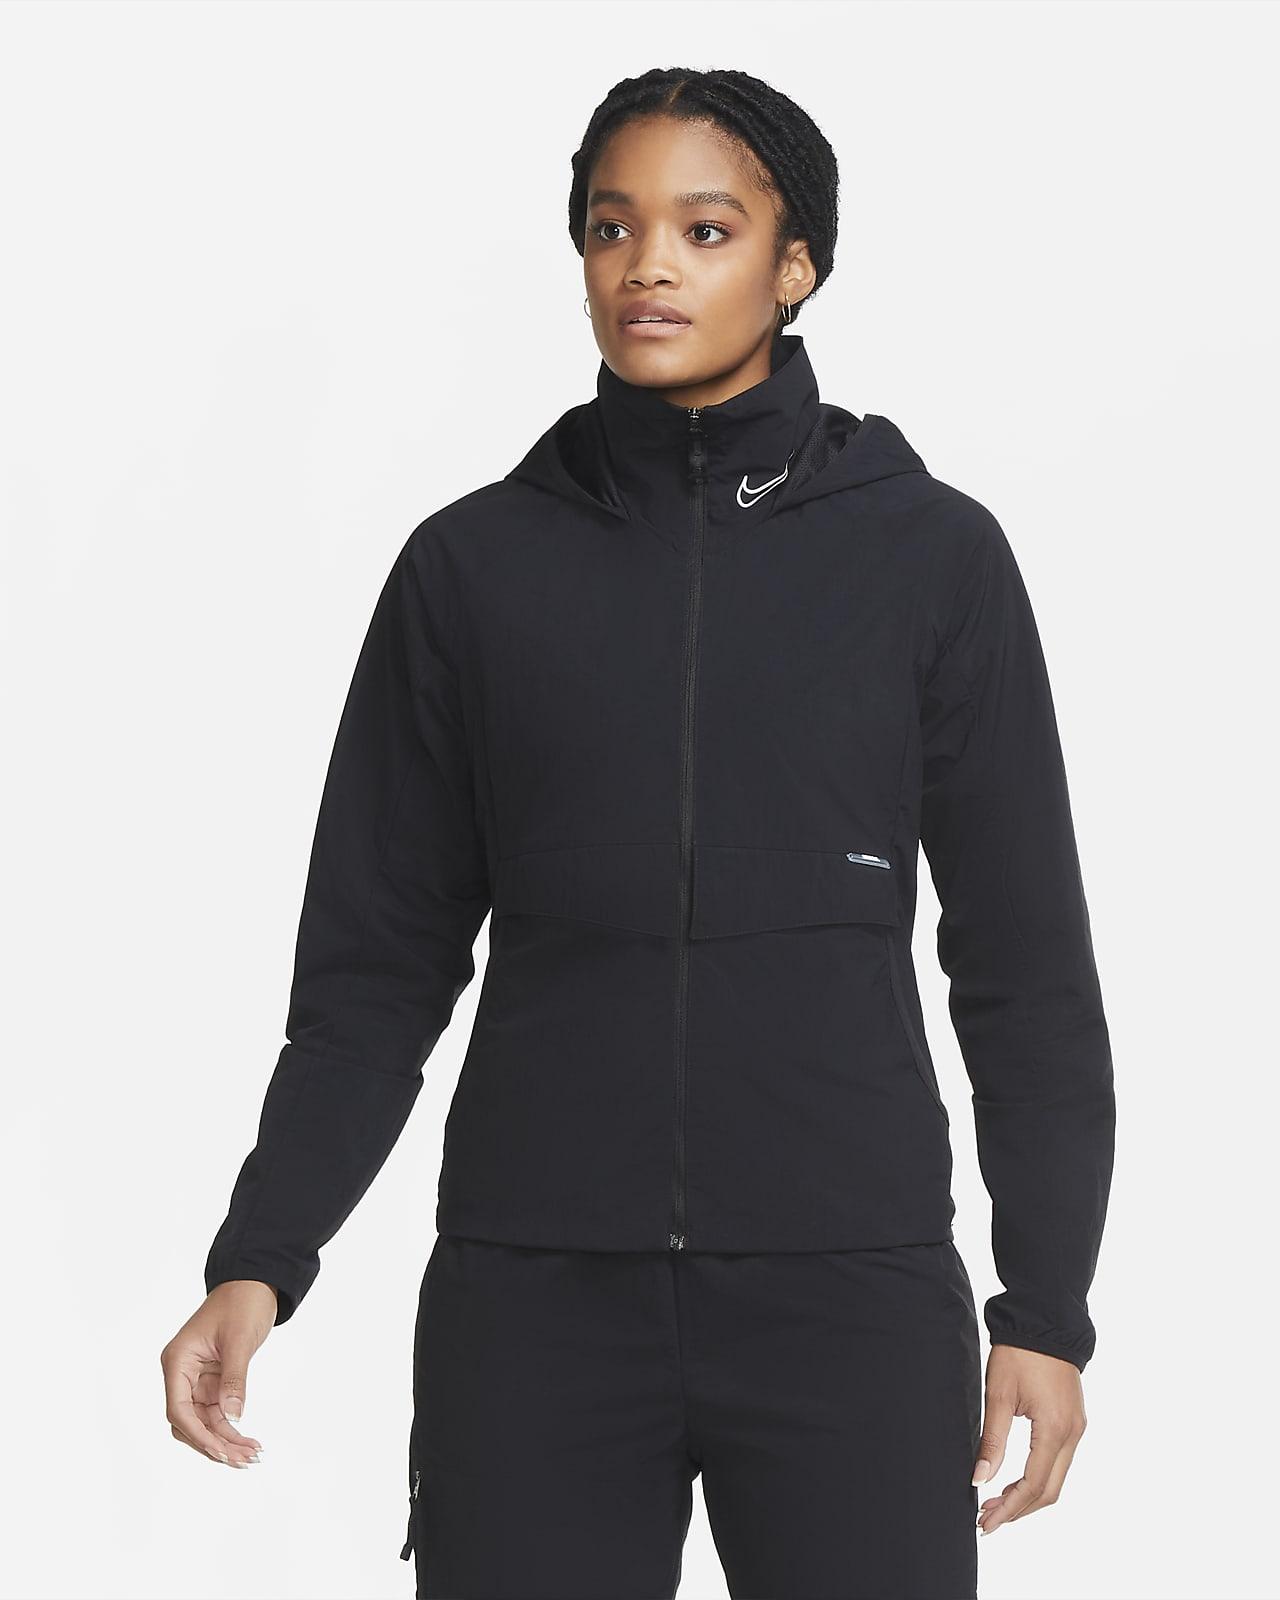 Nike F.C. AWF Women's Football Jacket